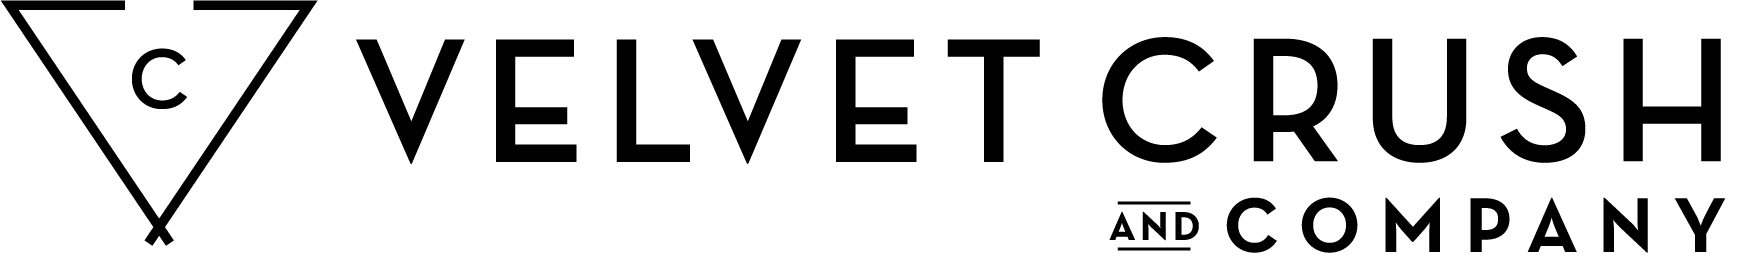 VC_Logo_Black_Horizontal.png